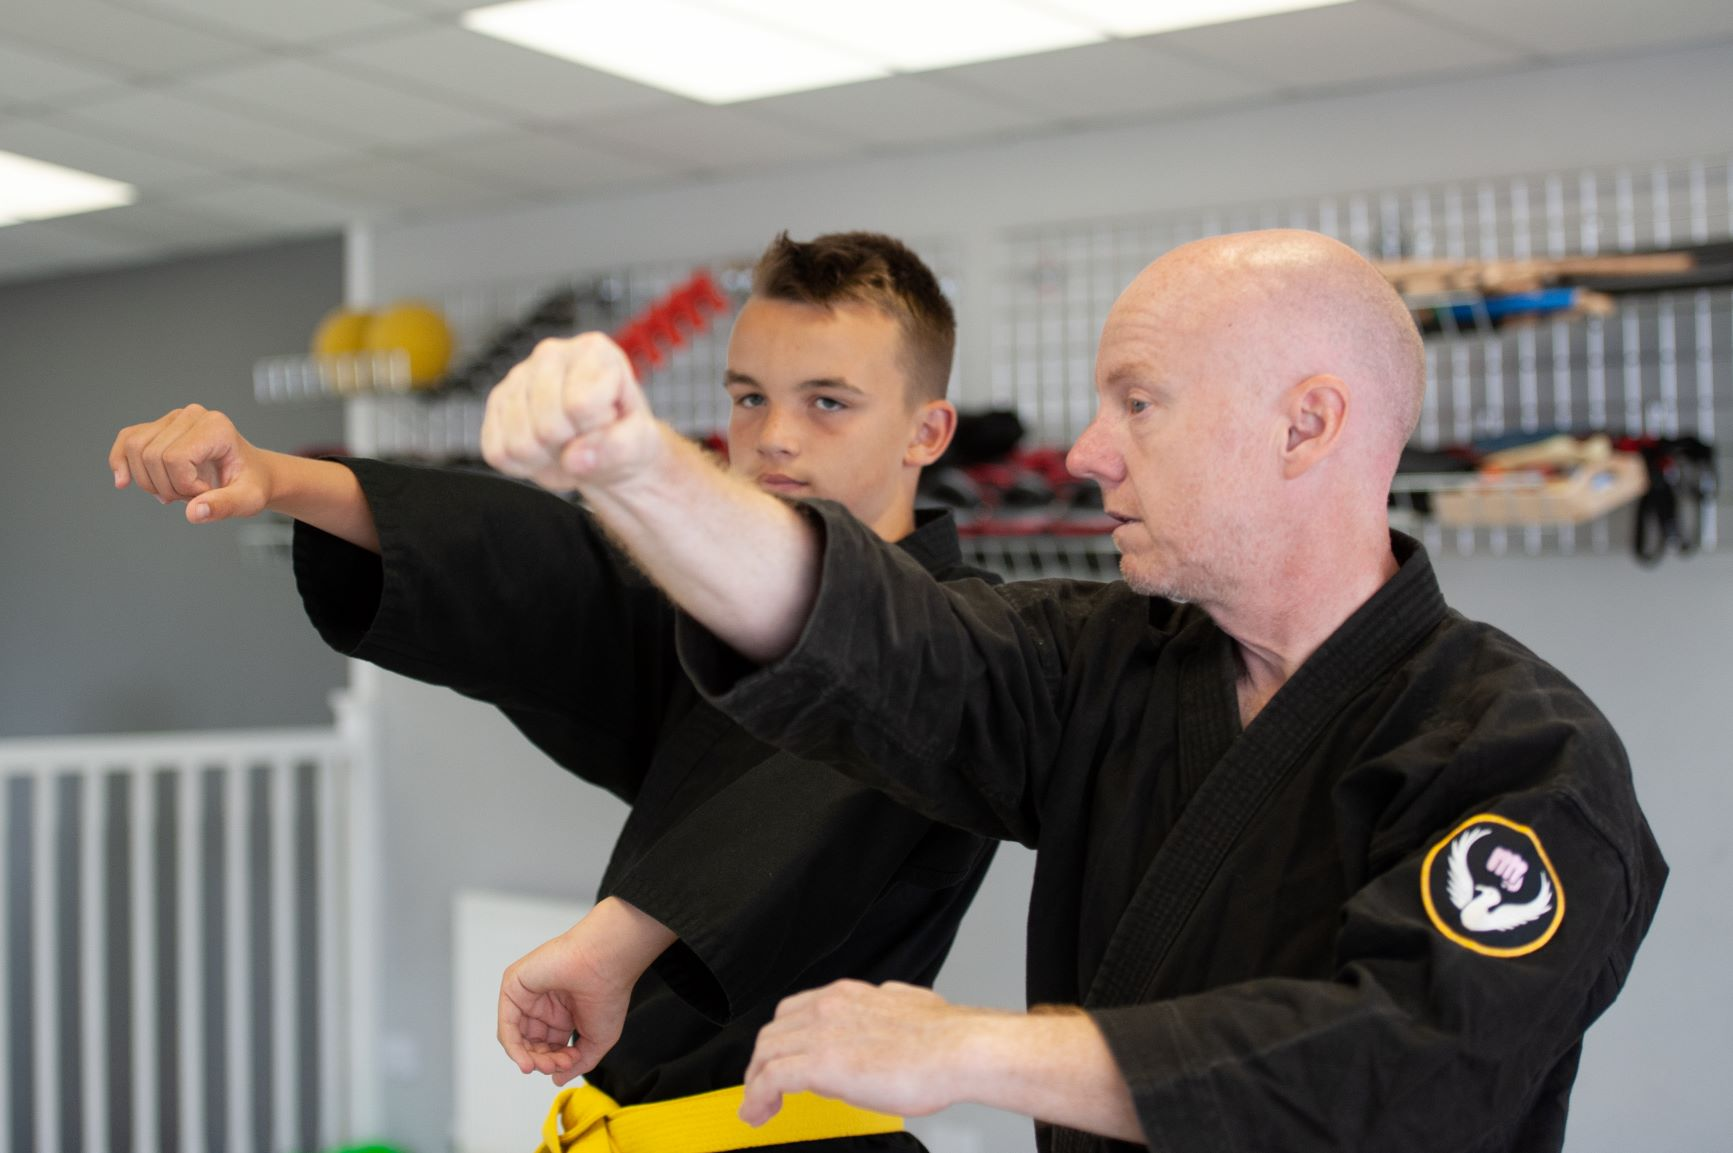 Martial Arts instructor in Cheltenham